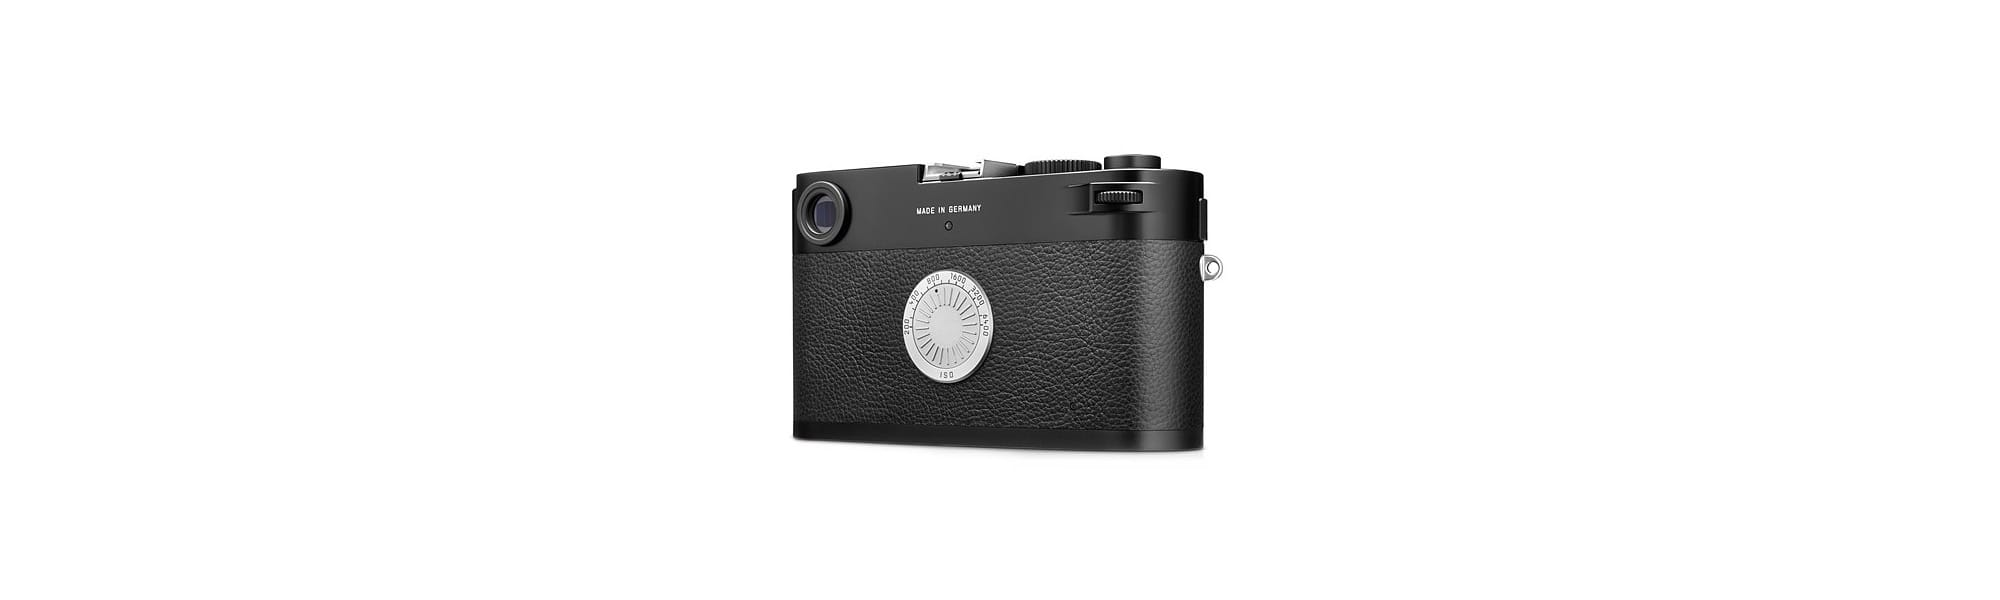 Leica-M-D-Typ-262-hero